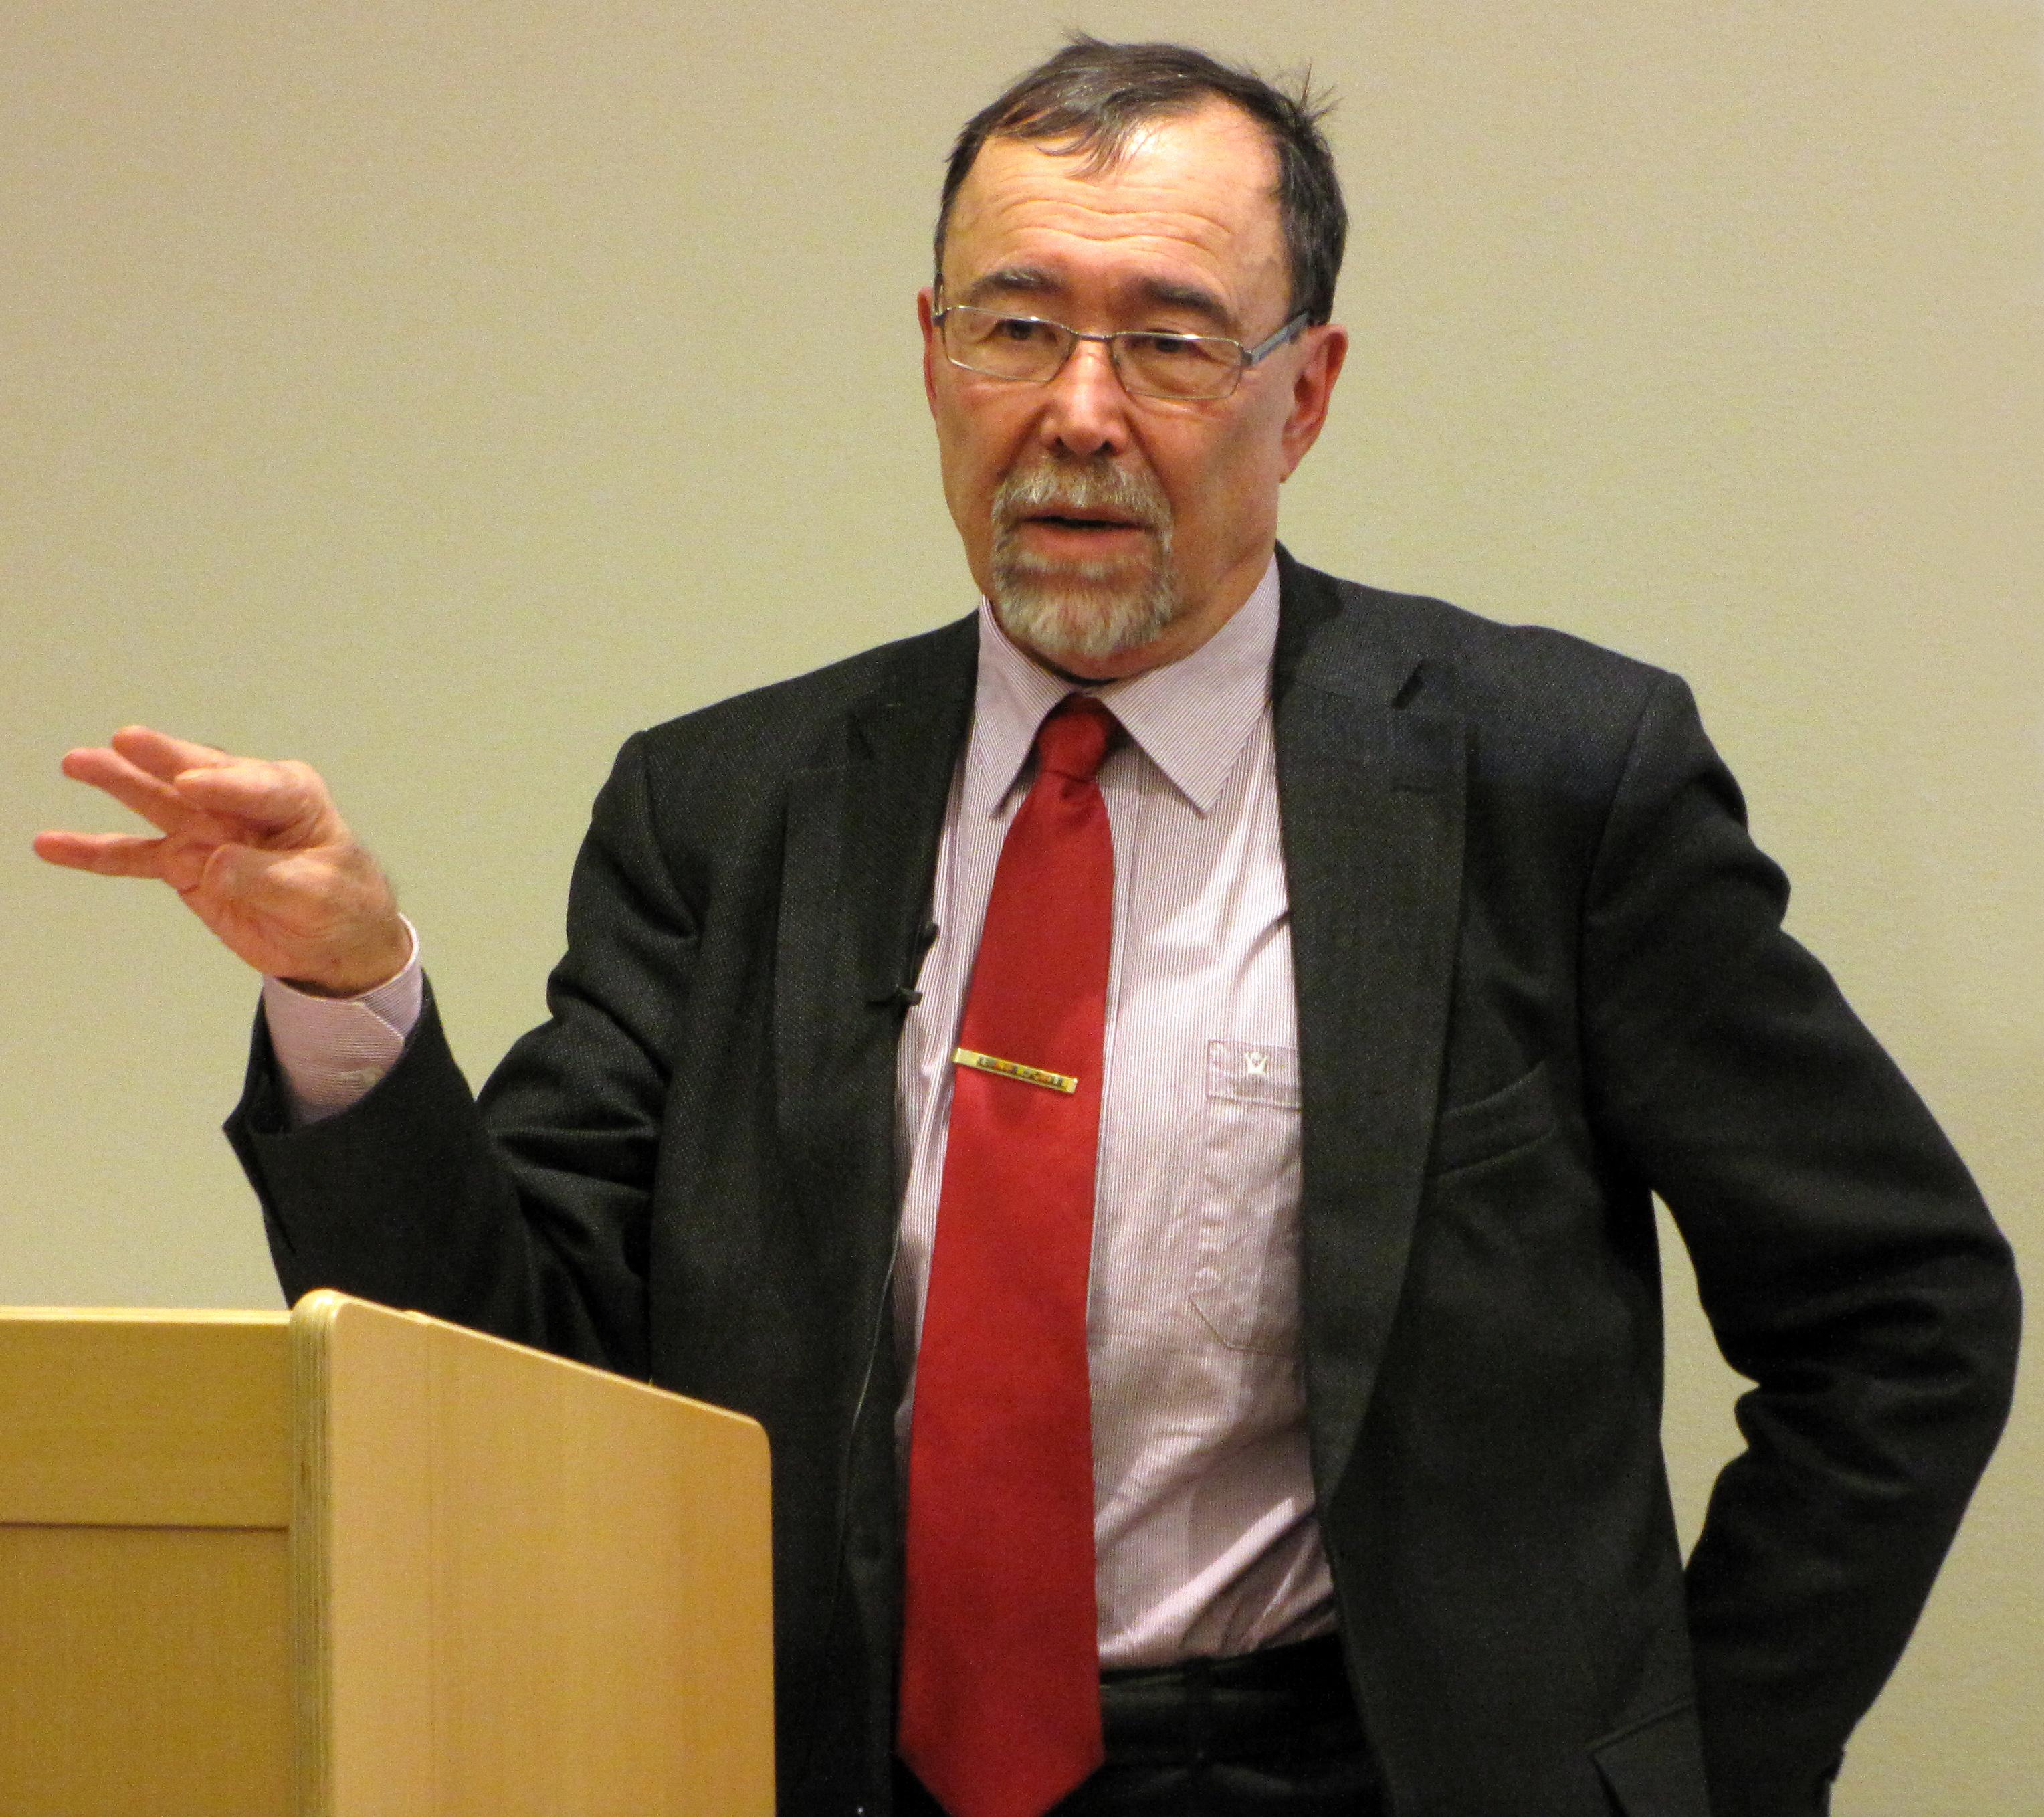 Kristian Gerner in 2012